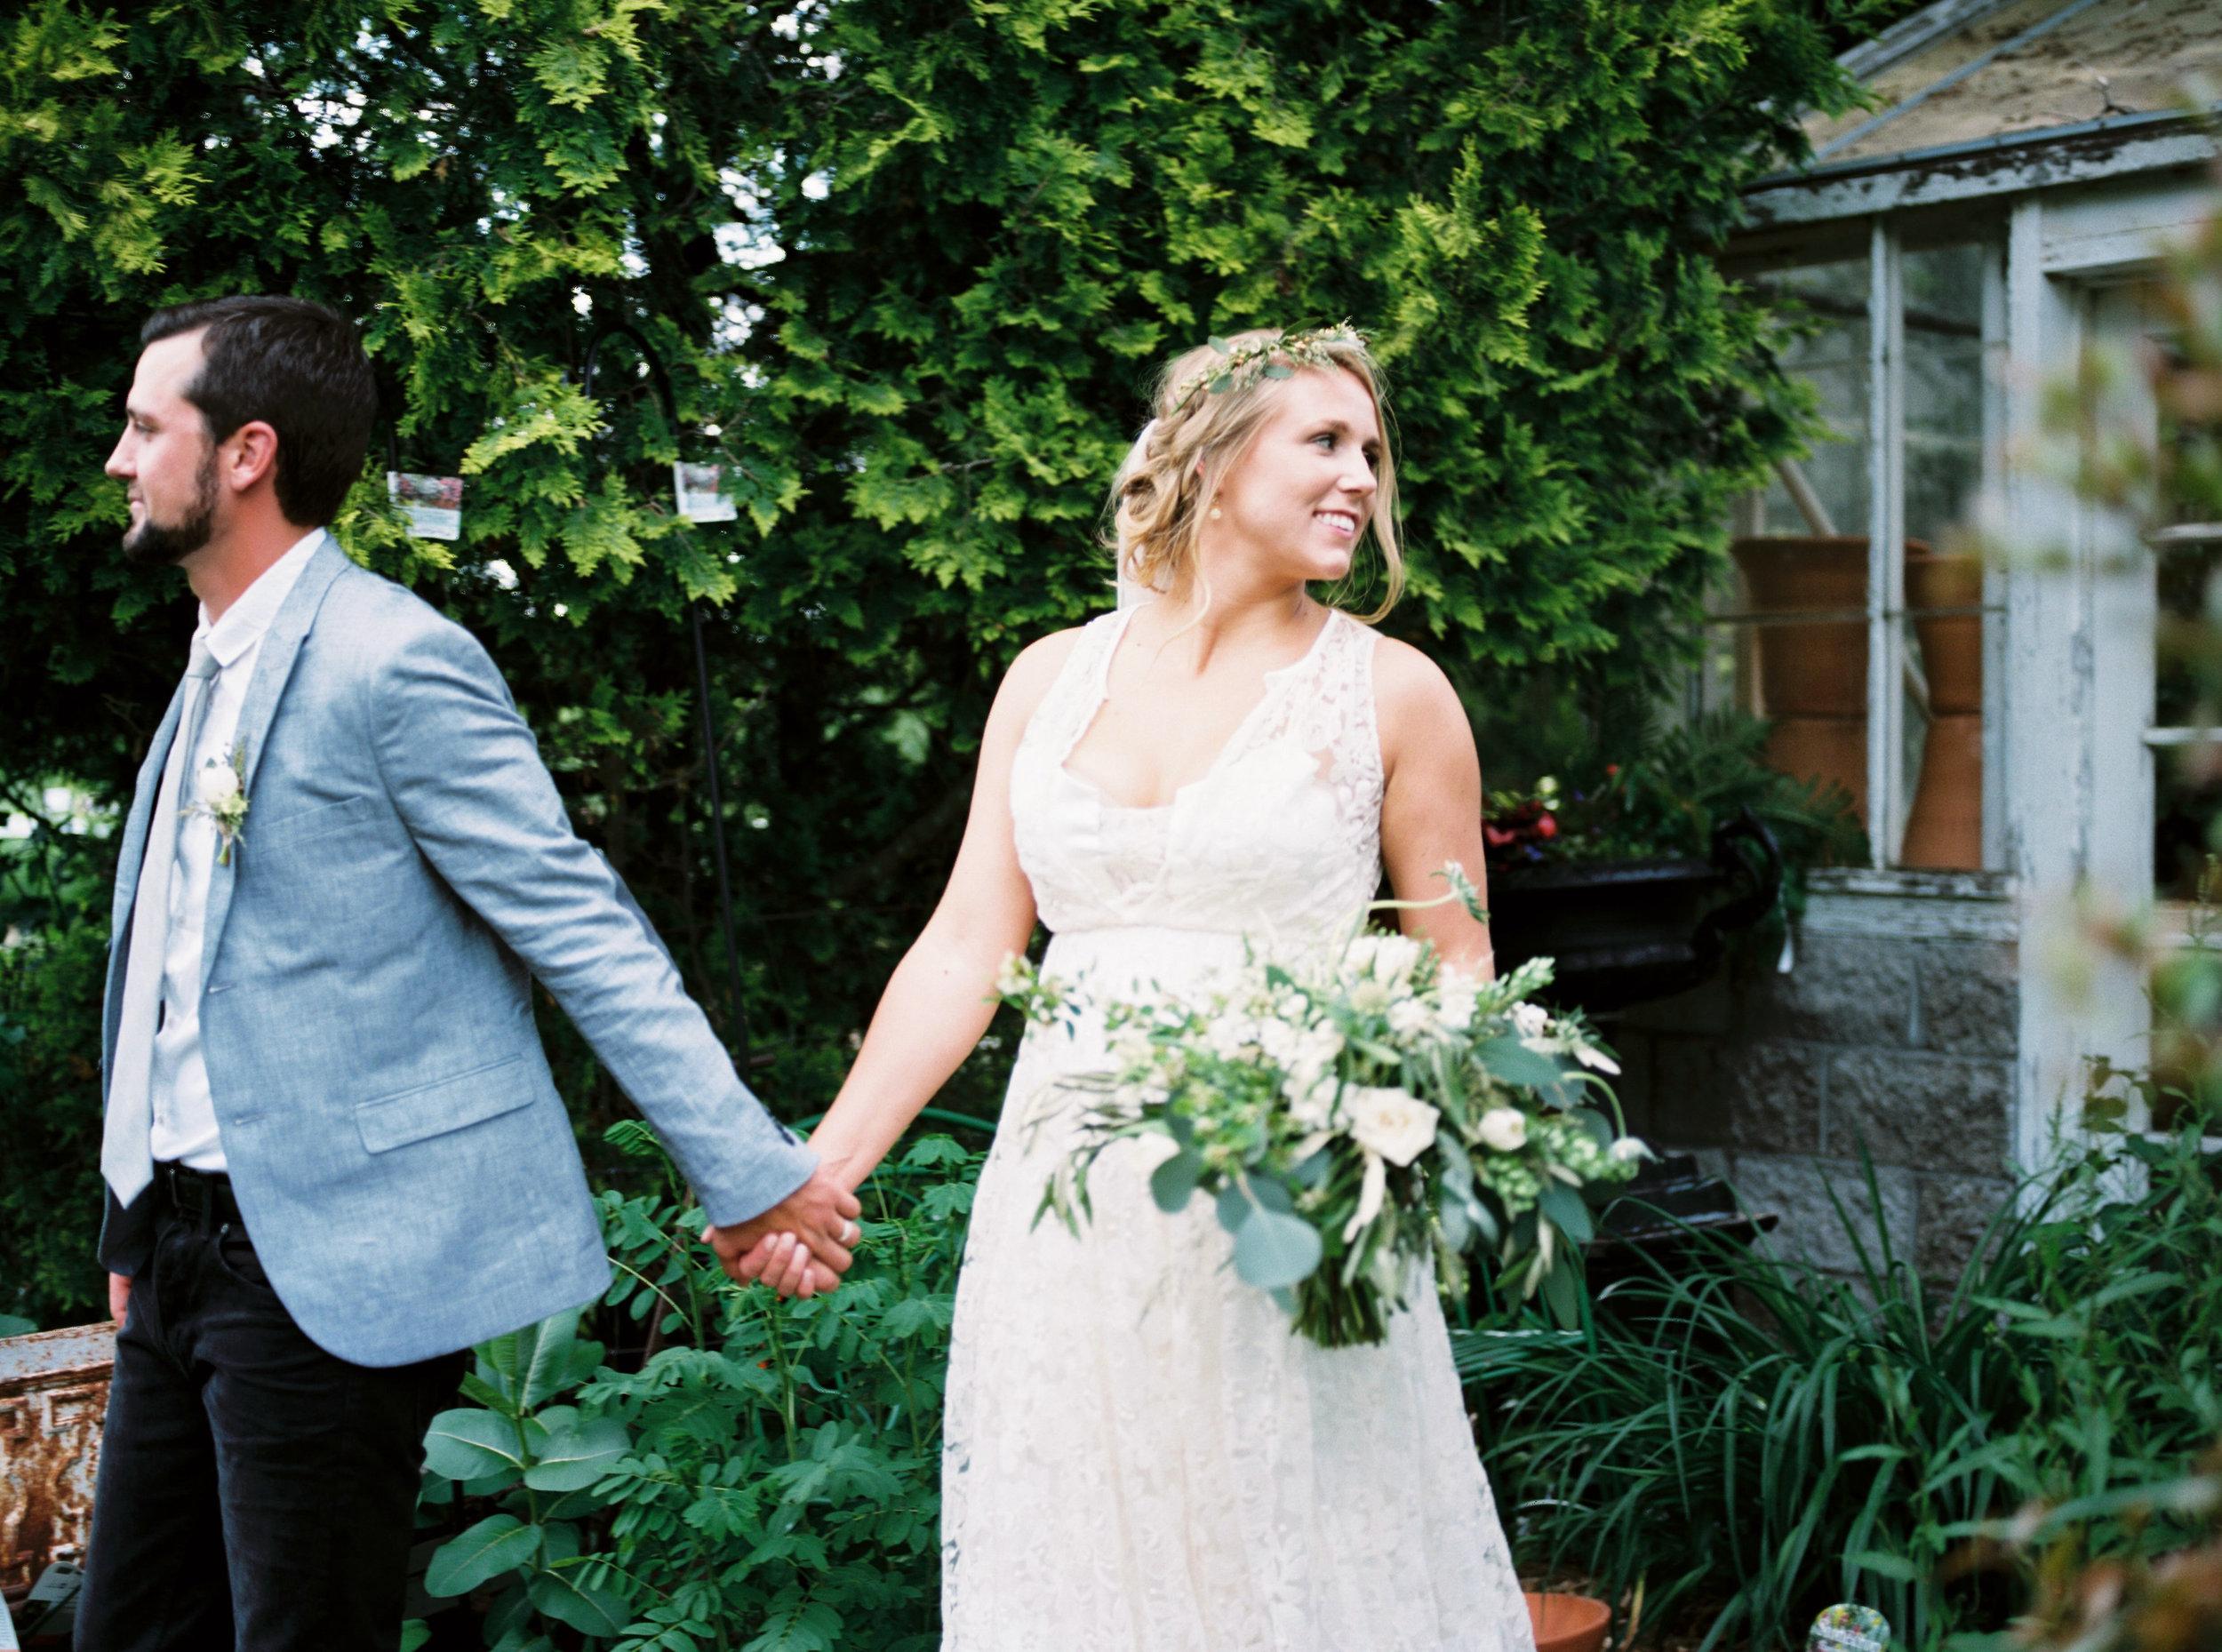 greenhouse-wedding-inspiration-by-laurelyn-savannah-photography-131.jpg